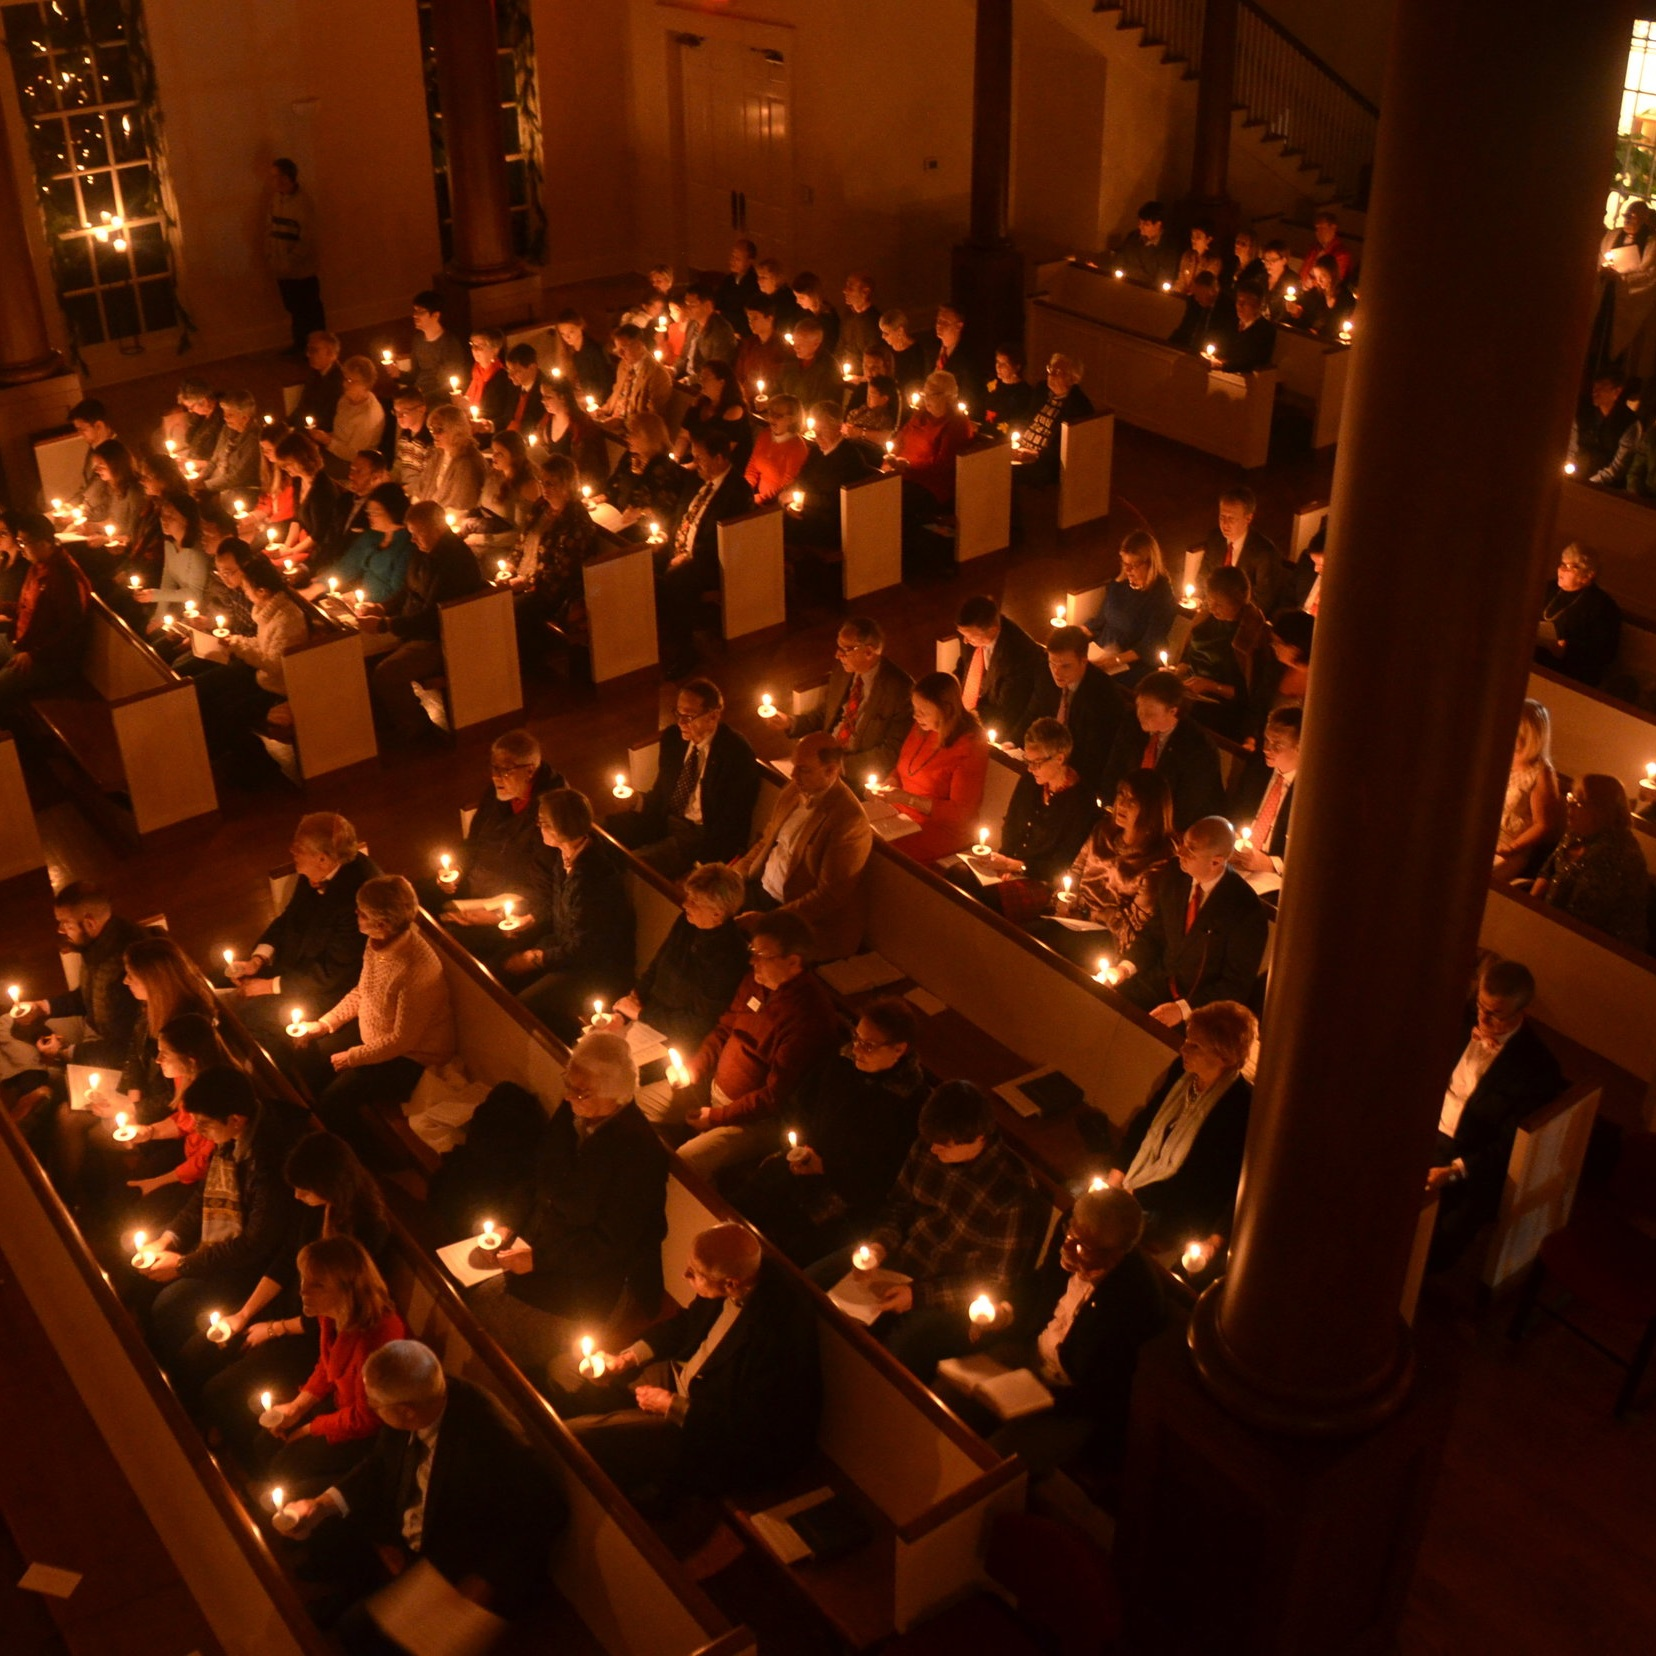 Candlelit church service